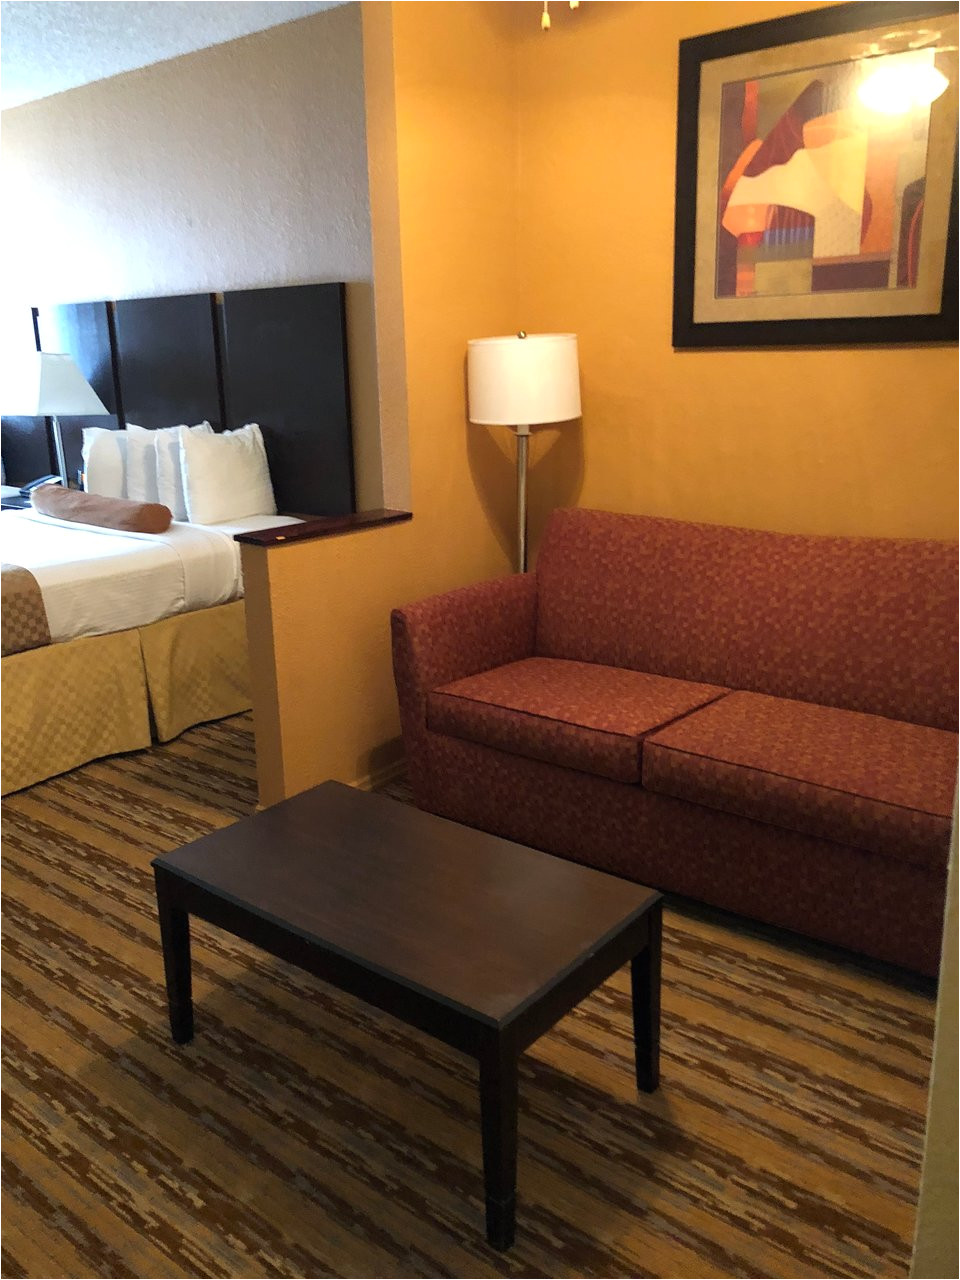 Used Hotel Furniture In orlando Florida Best Western Plus Universal Inn Updated 2018 Hotel Reviews Price